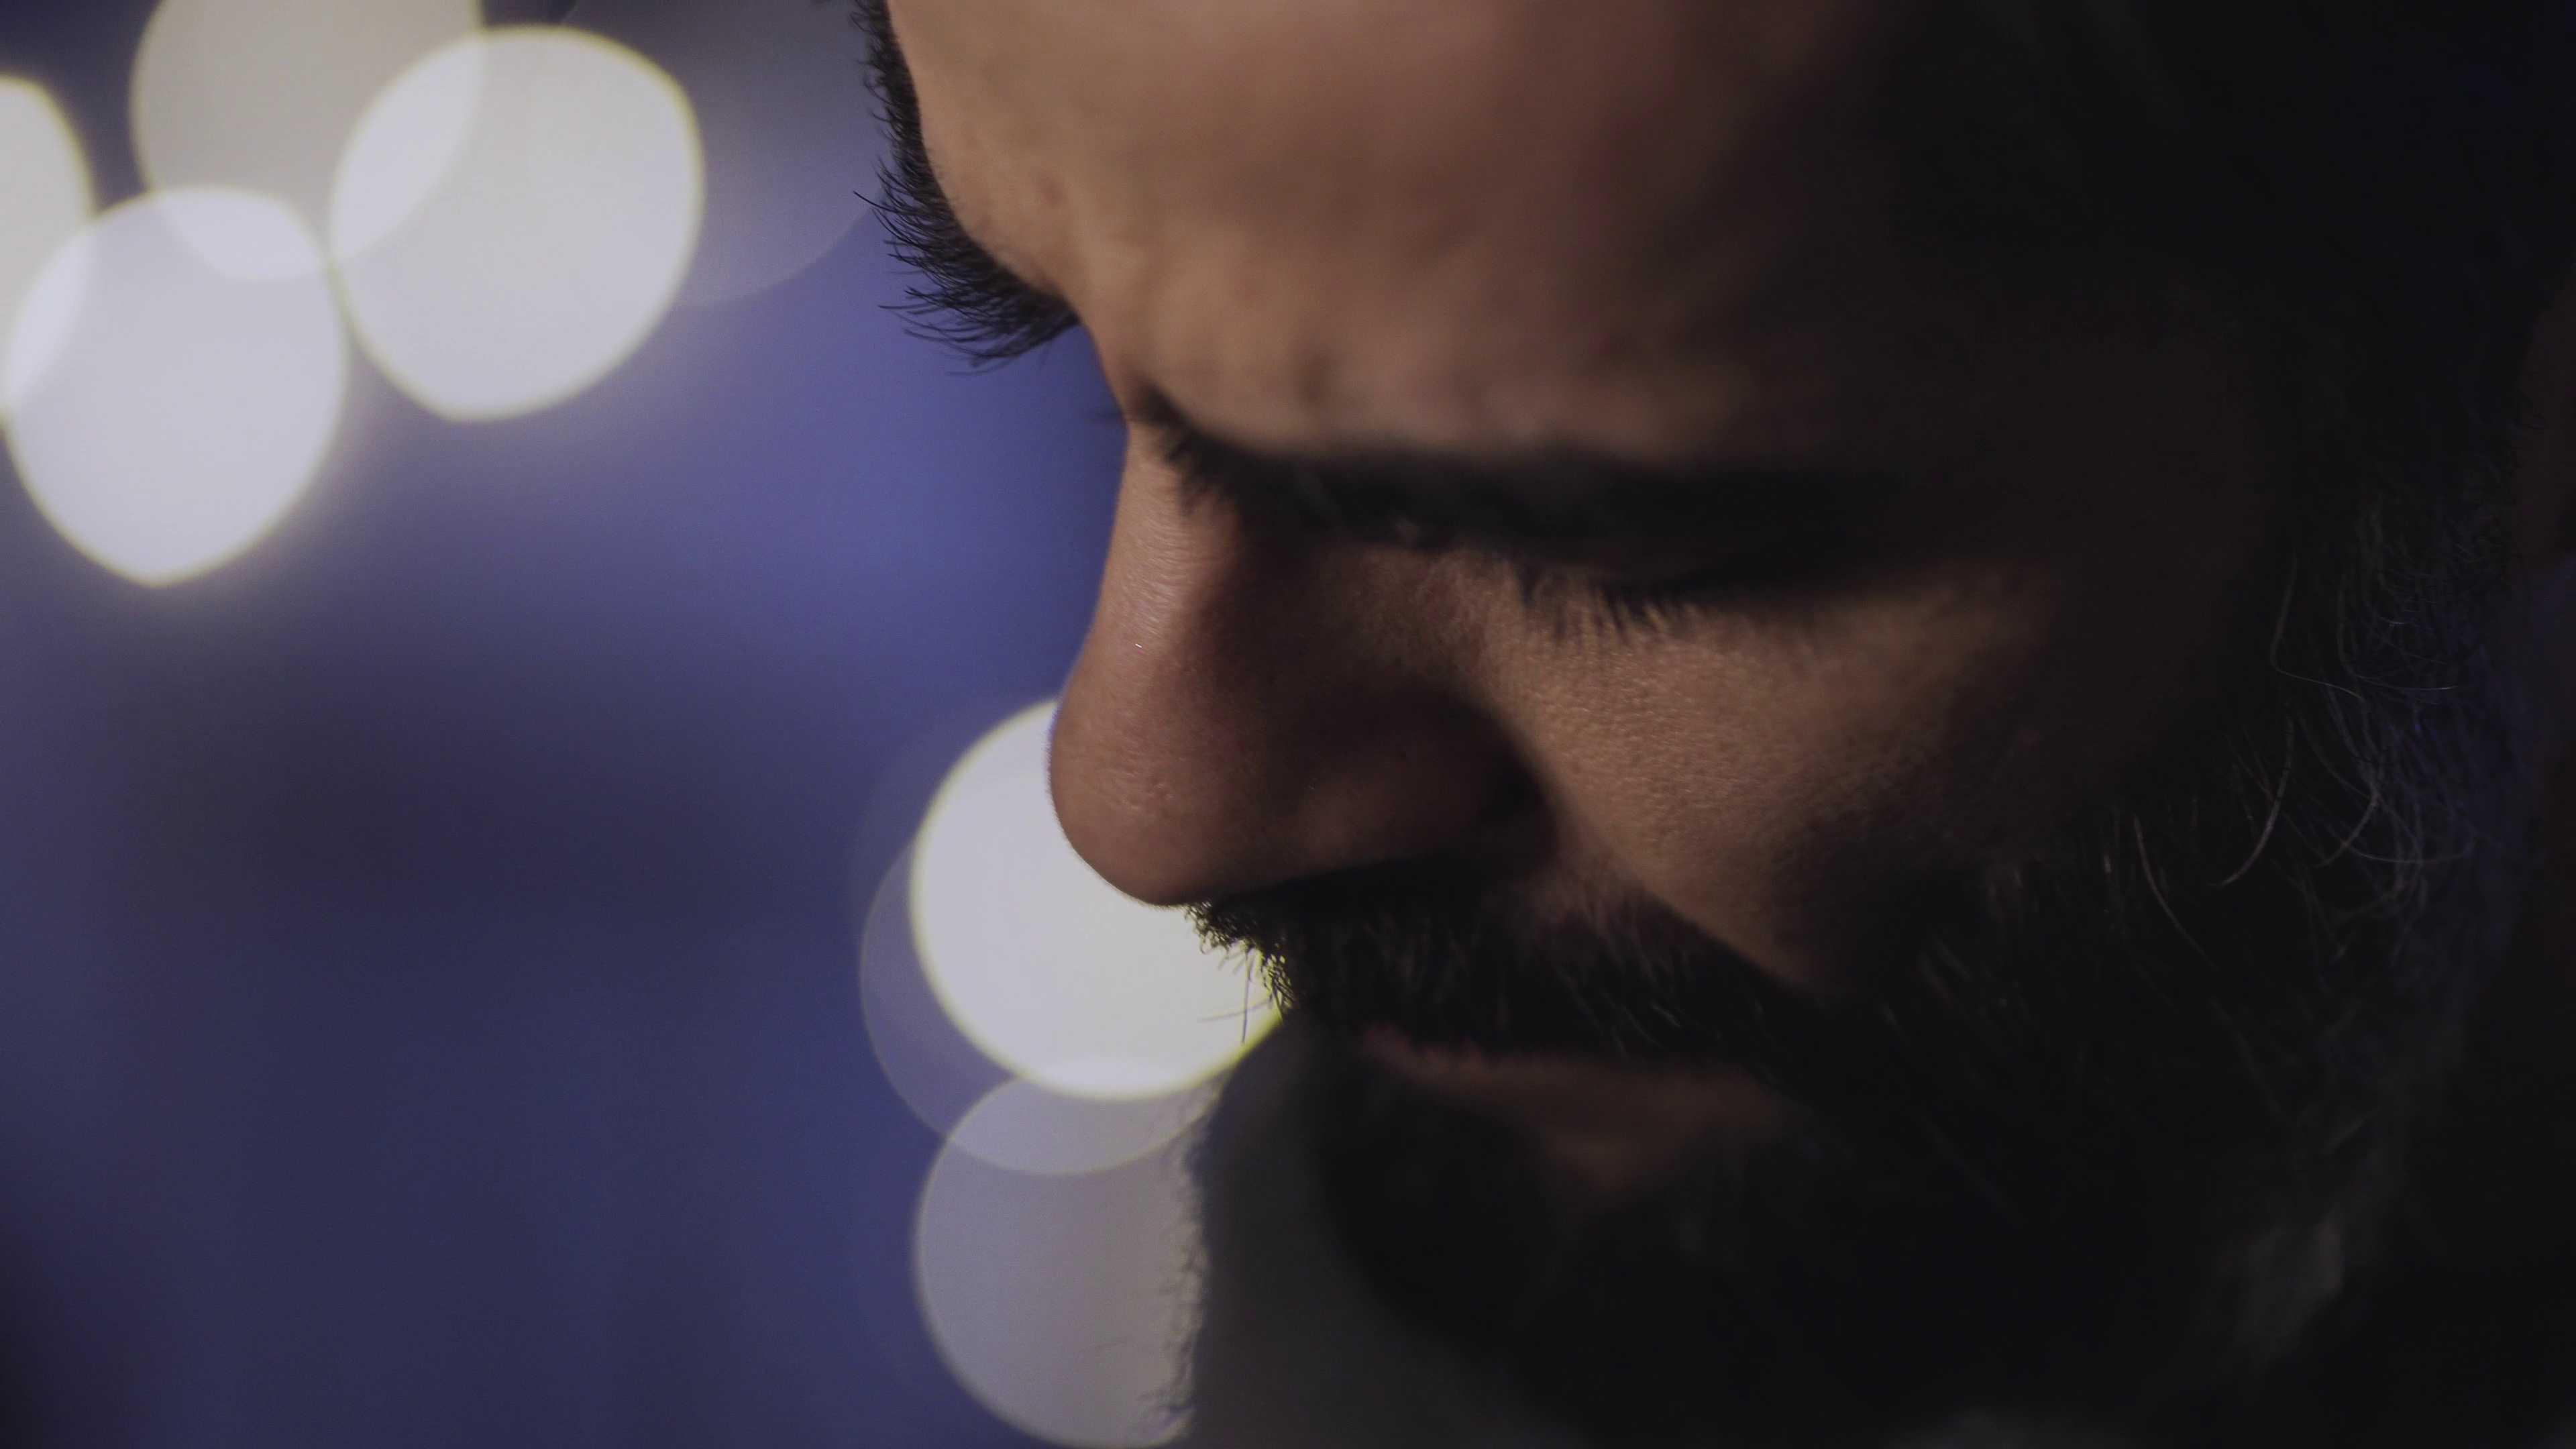 Aurea_-cornerstudio-Video-Clip-Music_commercial-fiction-film-2019_1_compressed